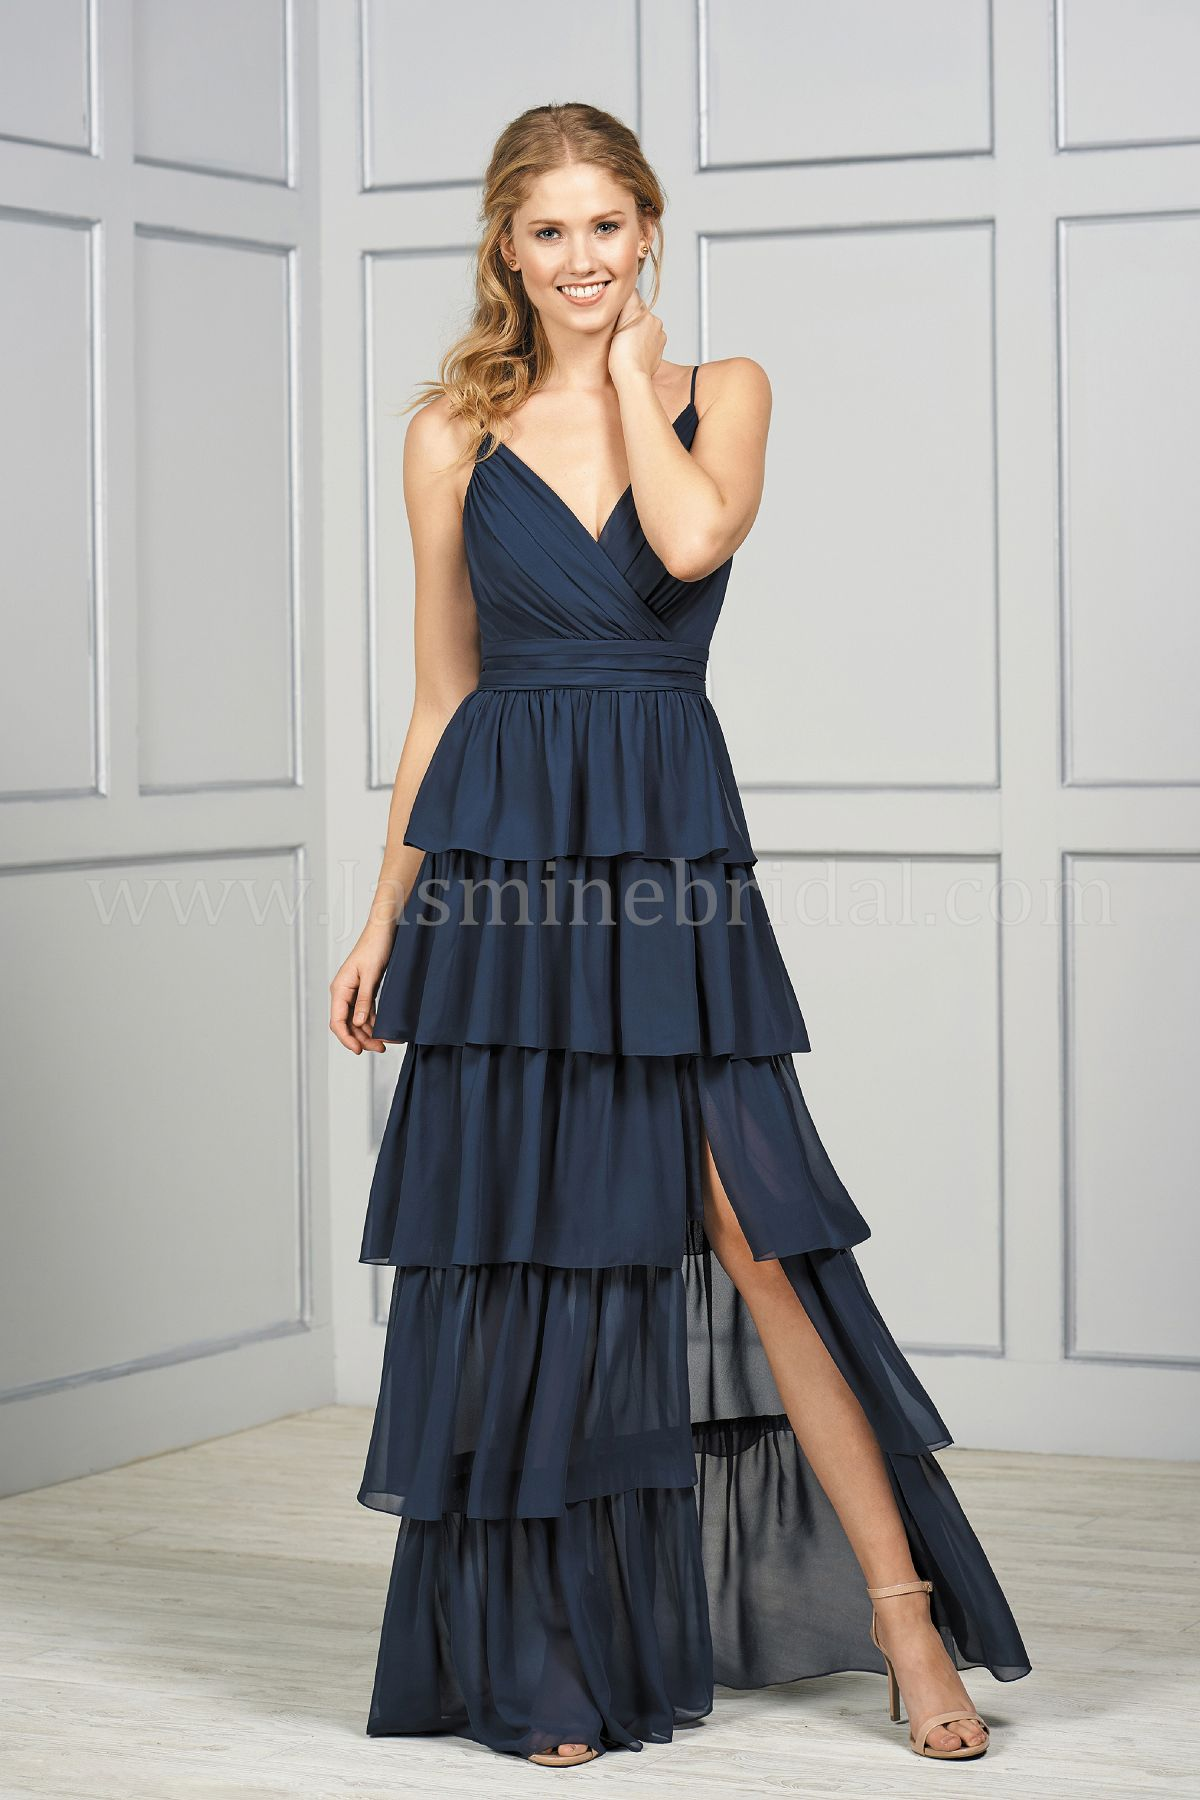 39ed4b1c83b B193051 Long V-neck Poly Chiffon Ruffled Bridesmaid Dress with Front Slit